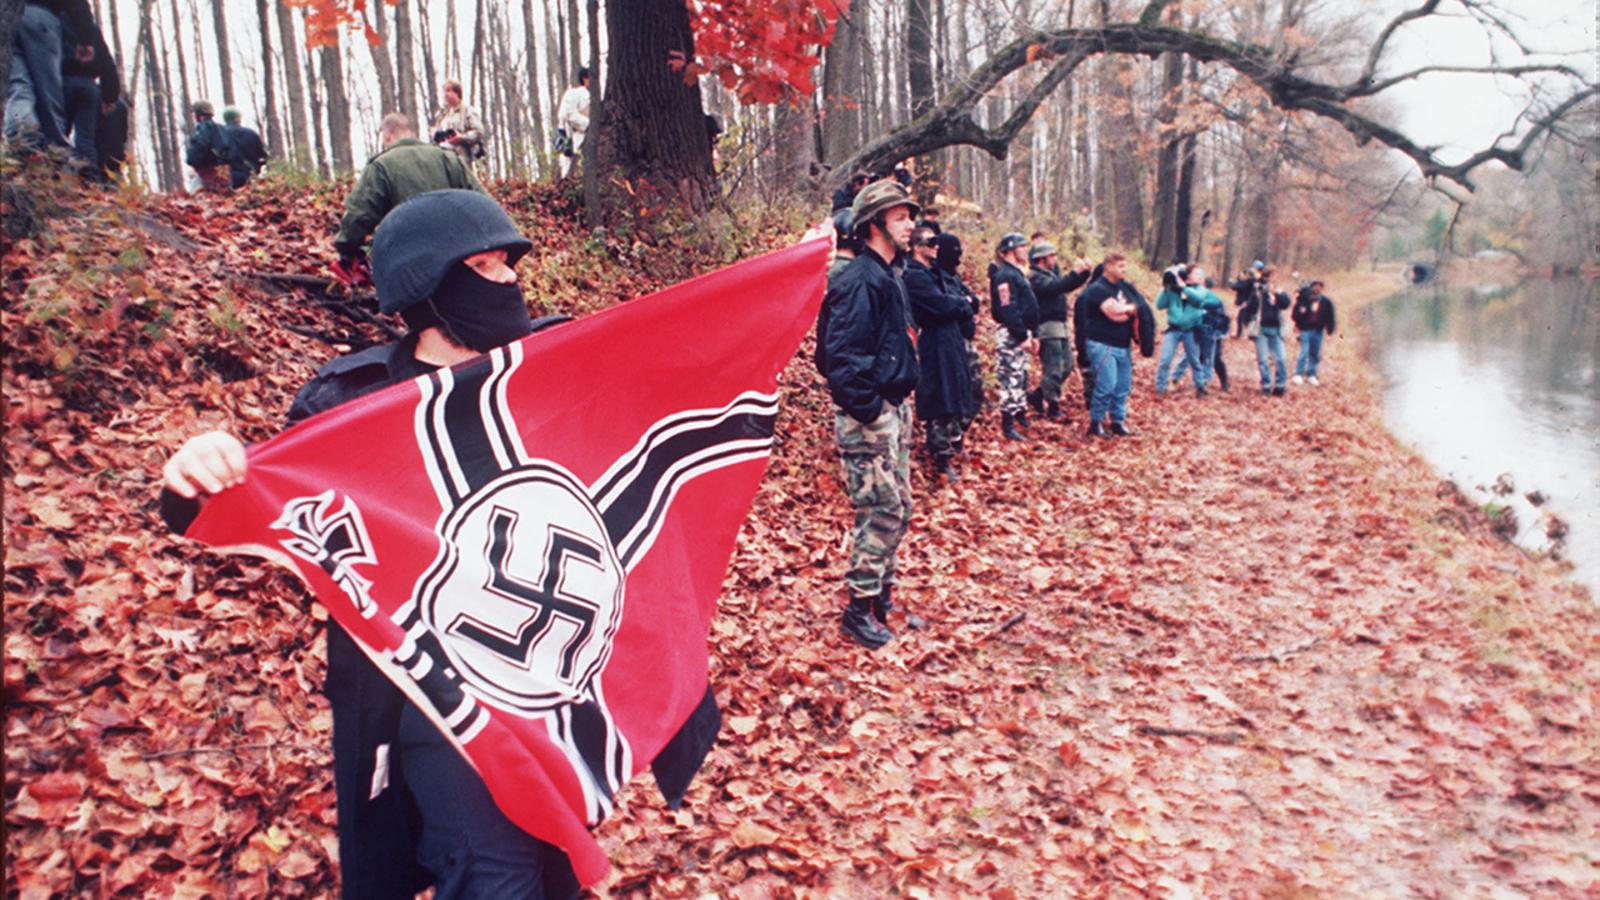 Extremist groups encourage members to spread coronavirus to police, Jews: FBI alert